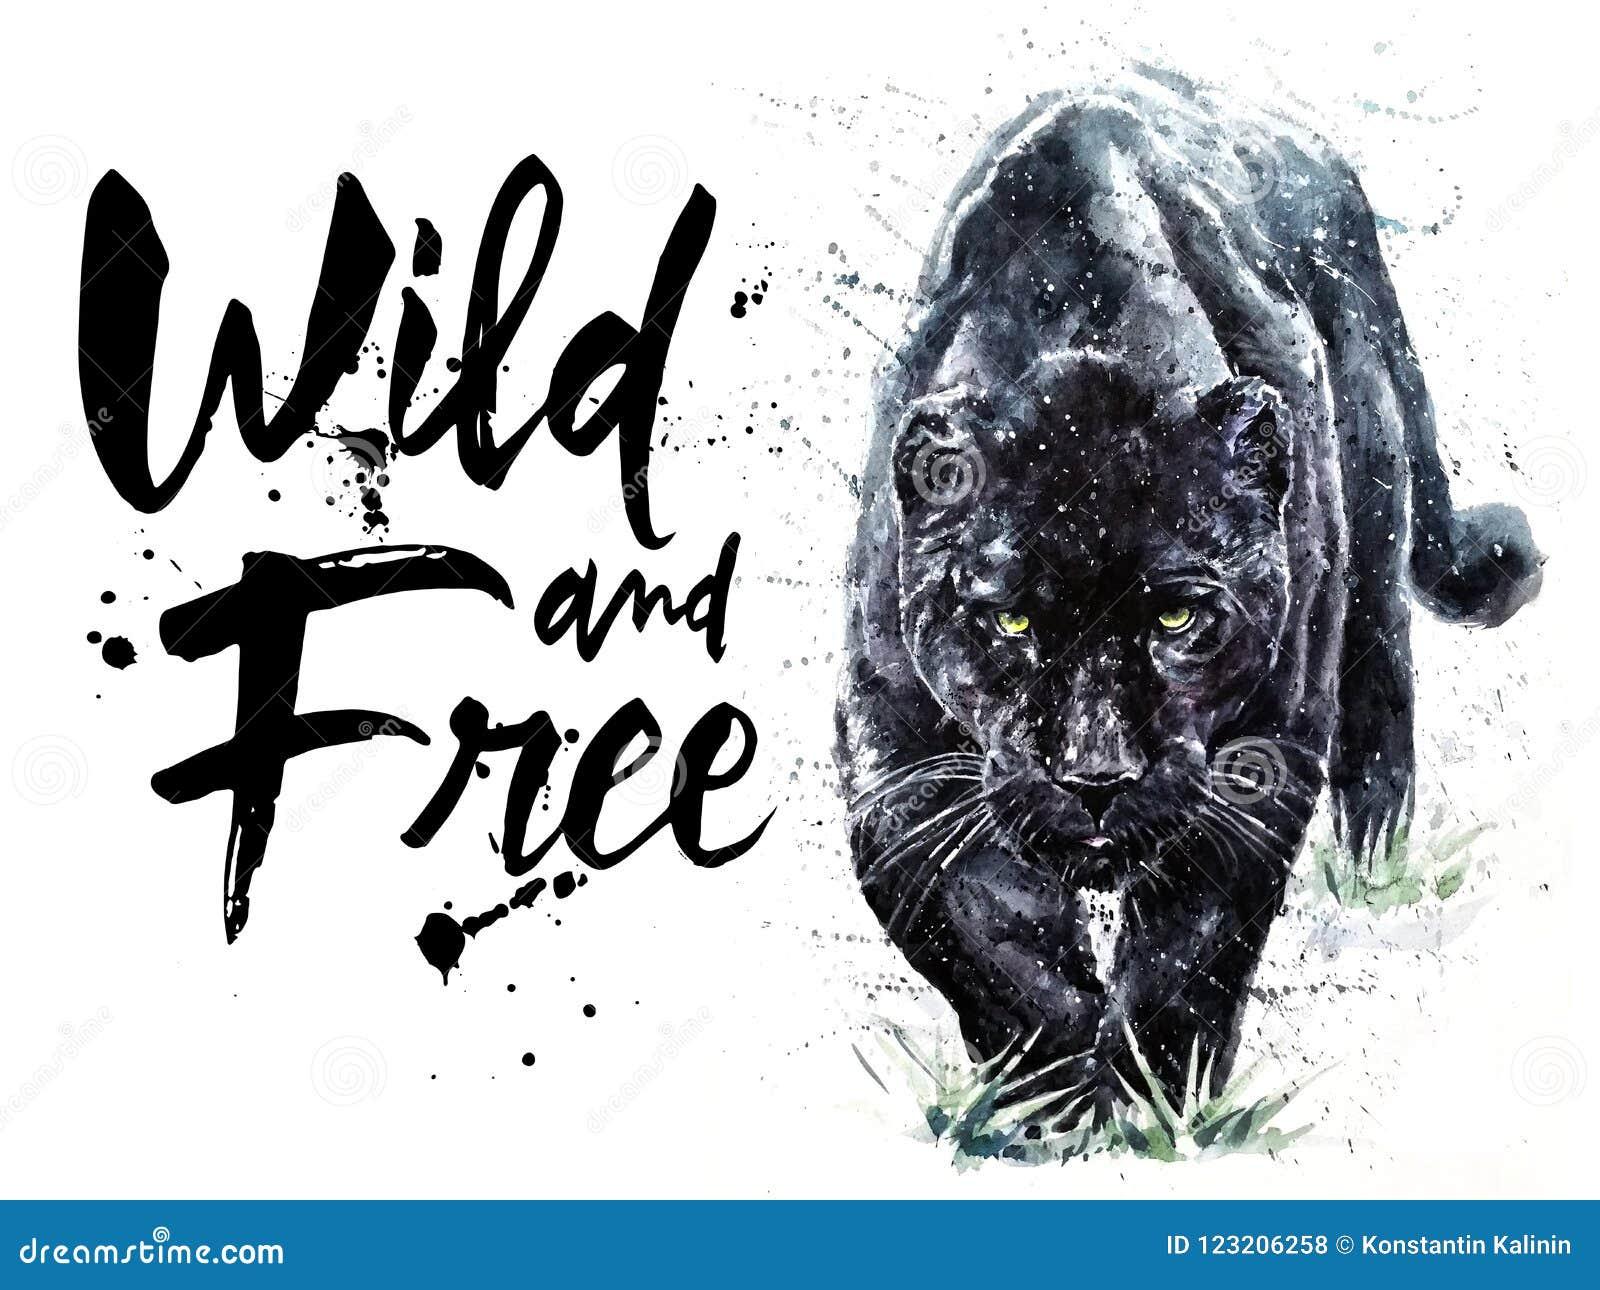 Panther Watercolor Painting Predator Animals Puma Jaguar Wild Free Stock Illustration Illustration Of Beautiful Background 123206258